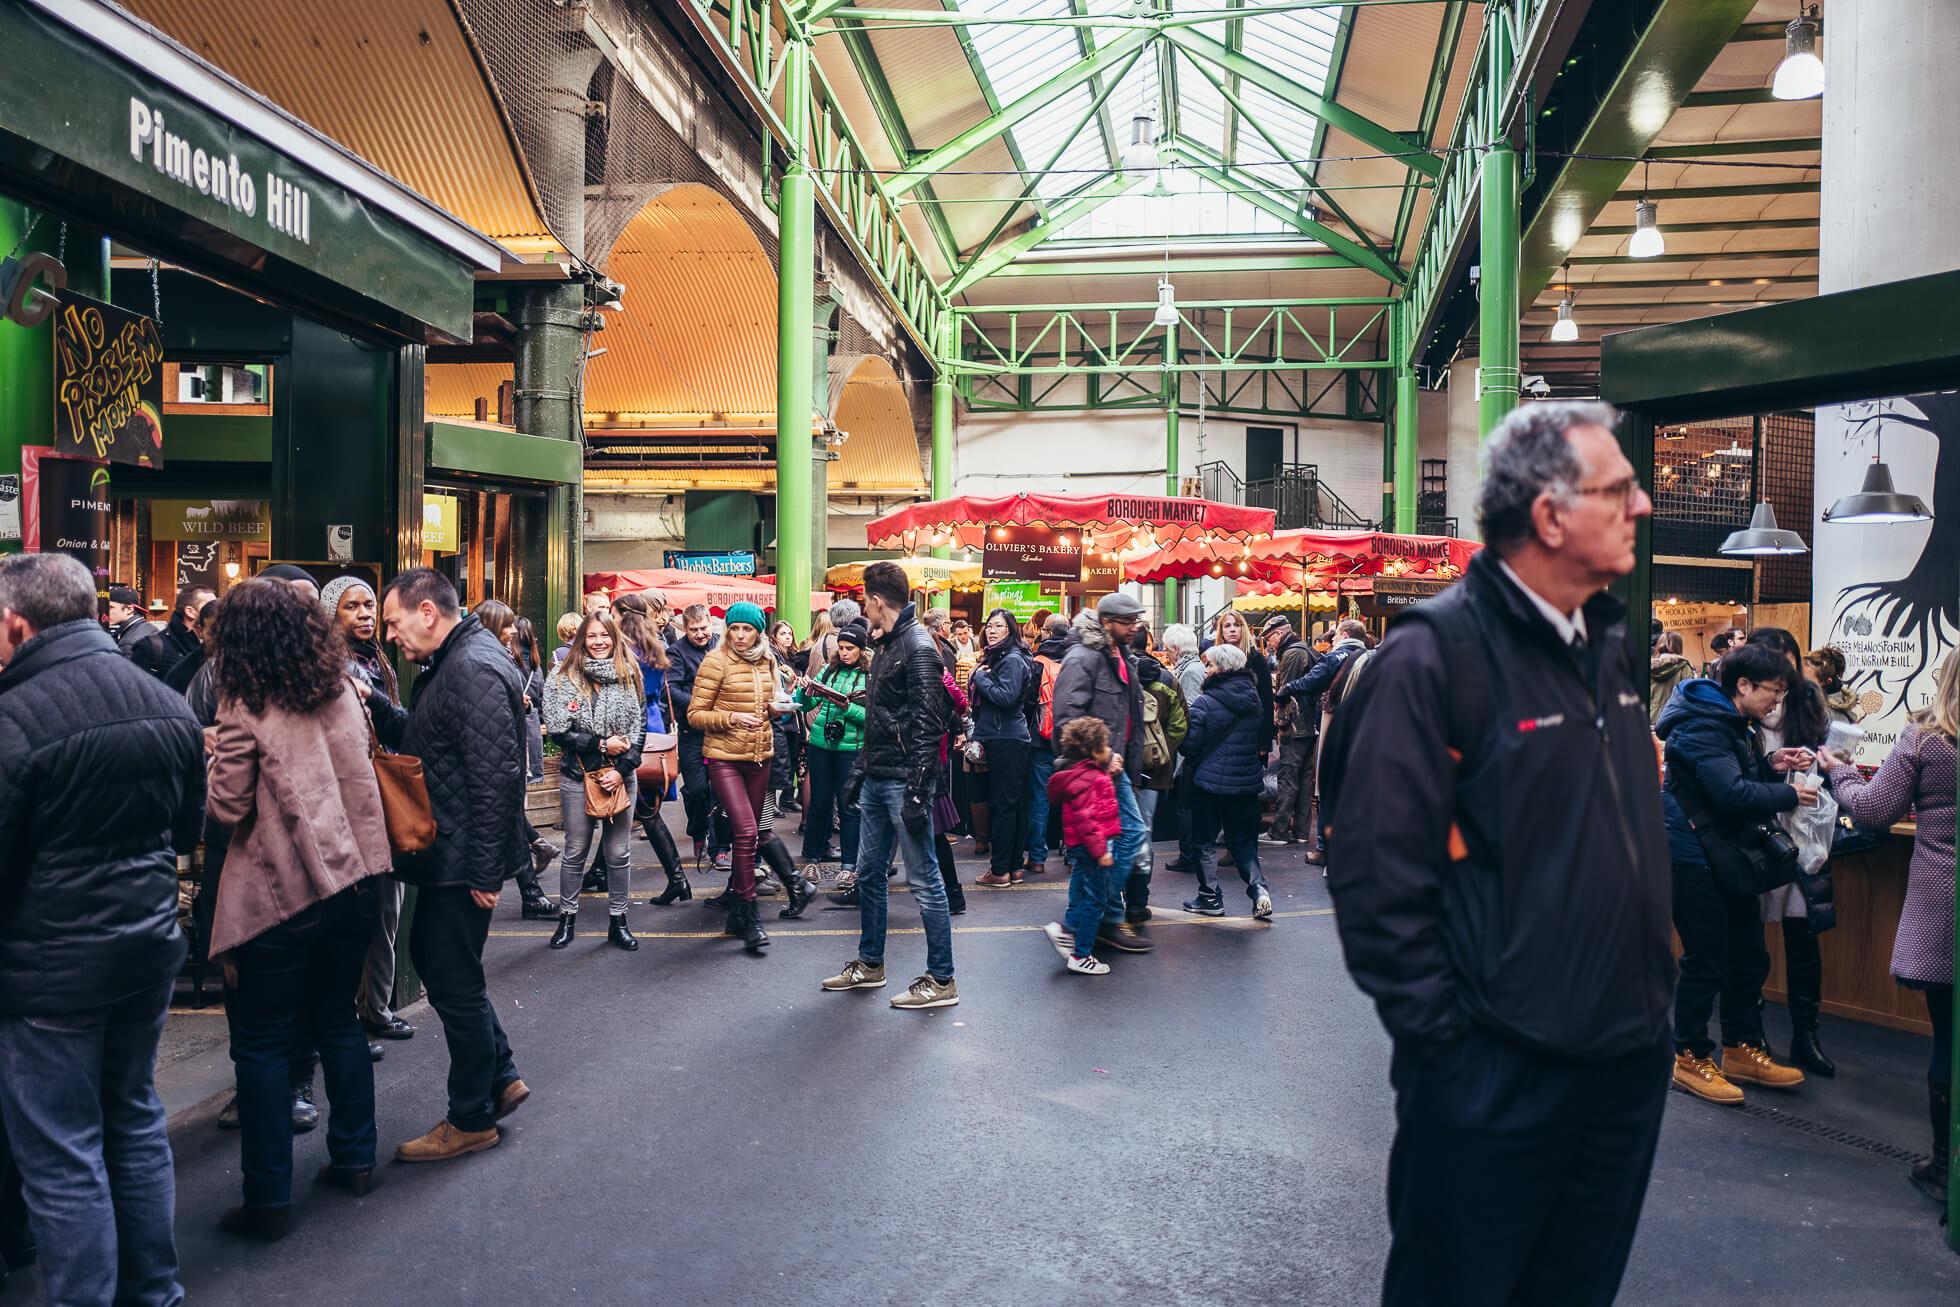 janni-deler-bourough-market-londonl1160277